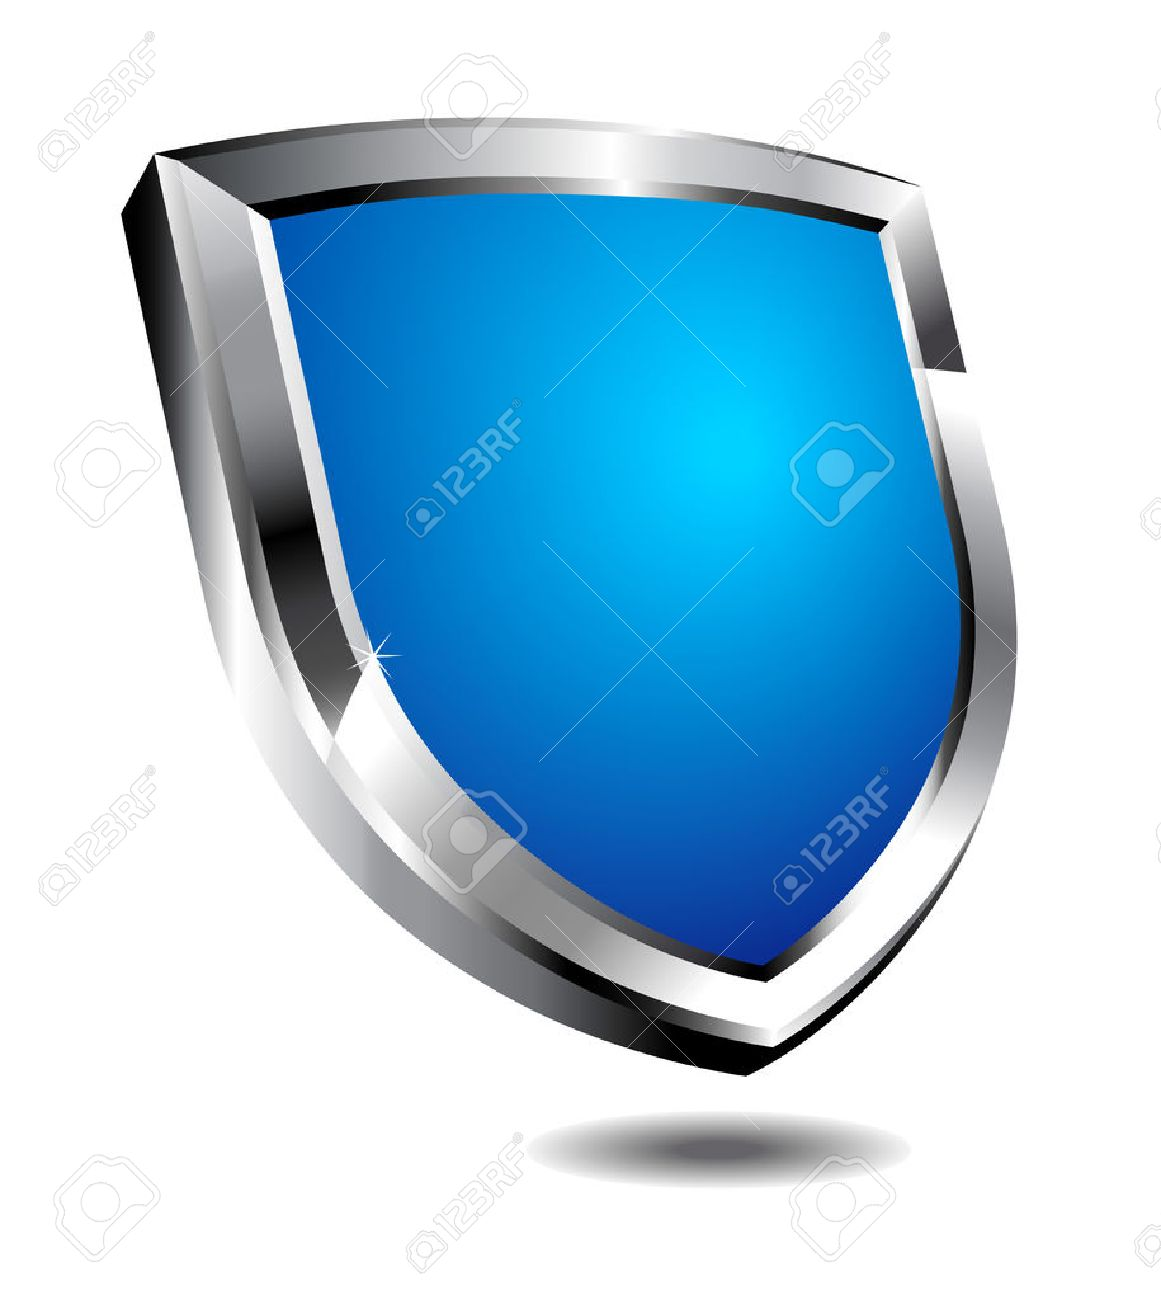 Modern Blue Shield - 9088028